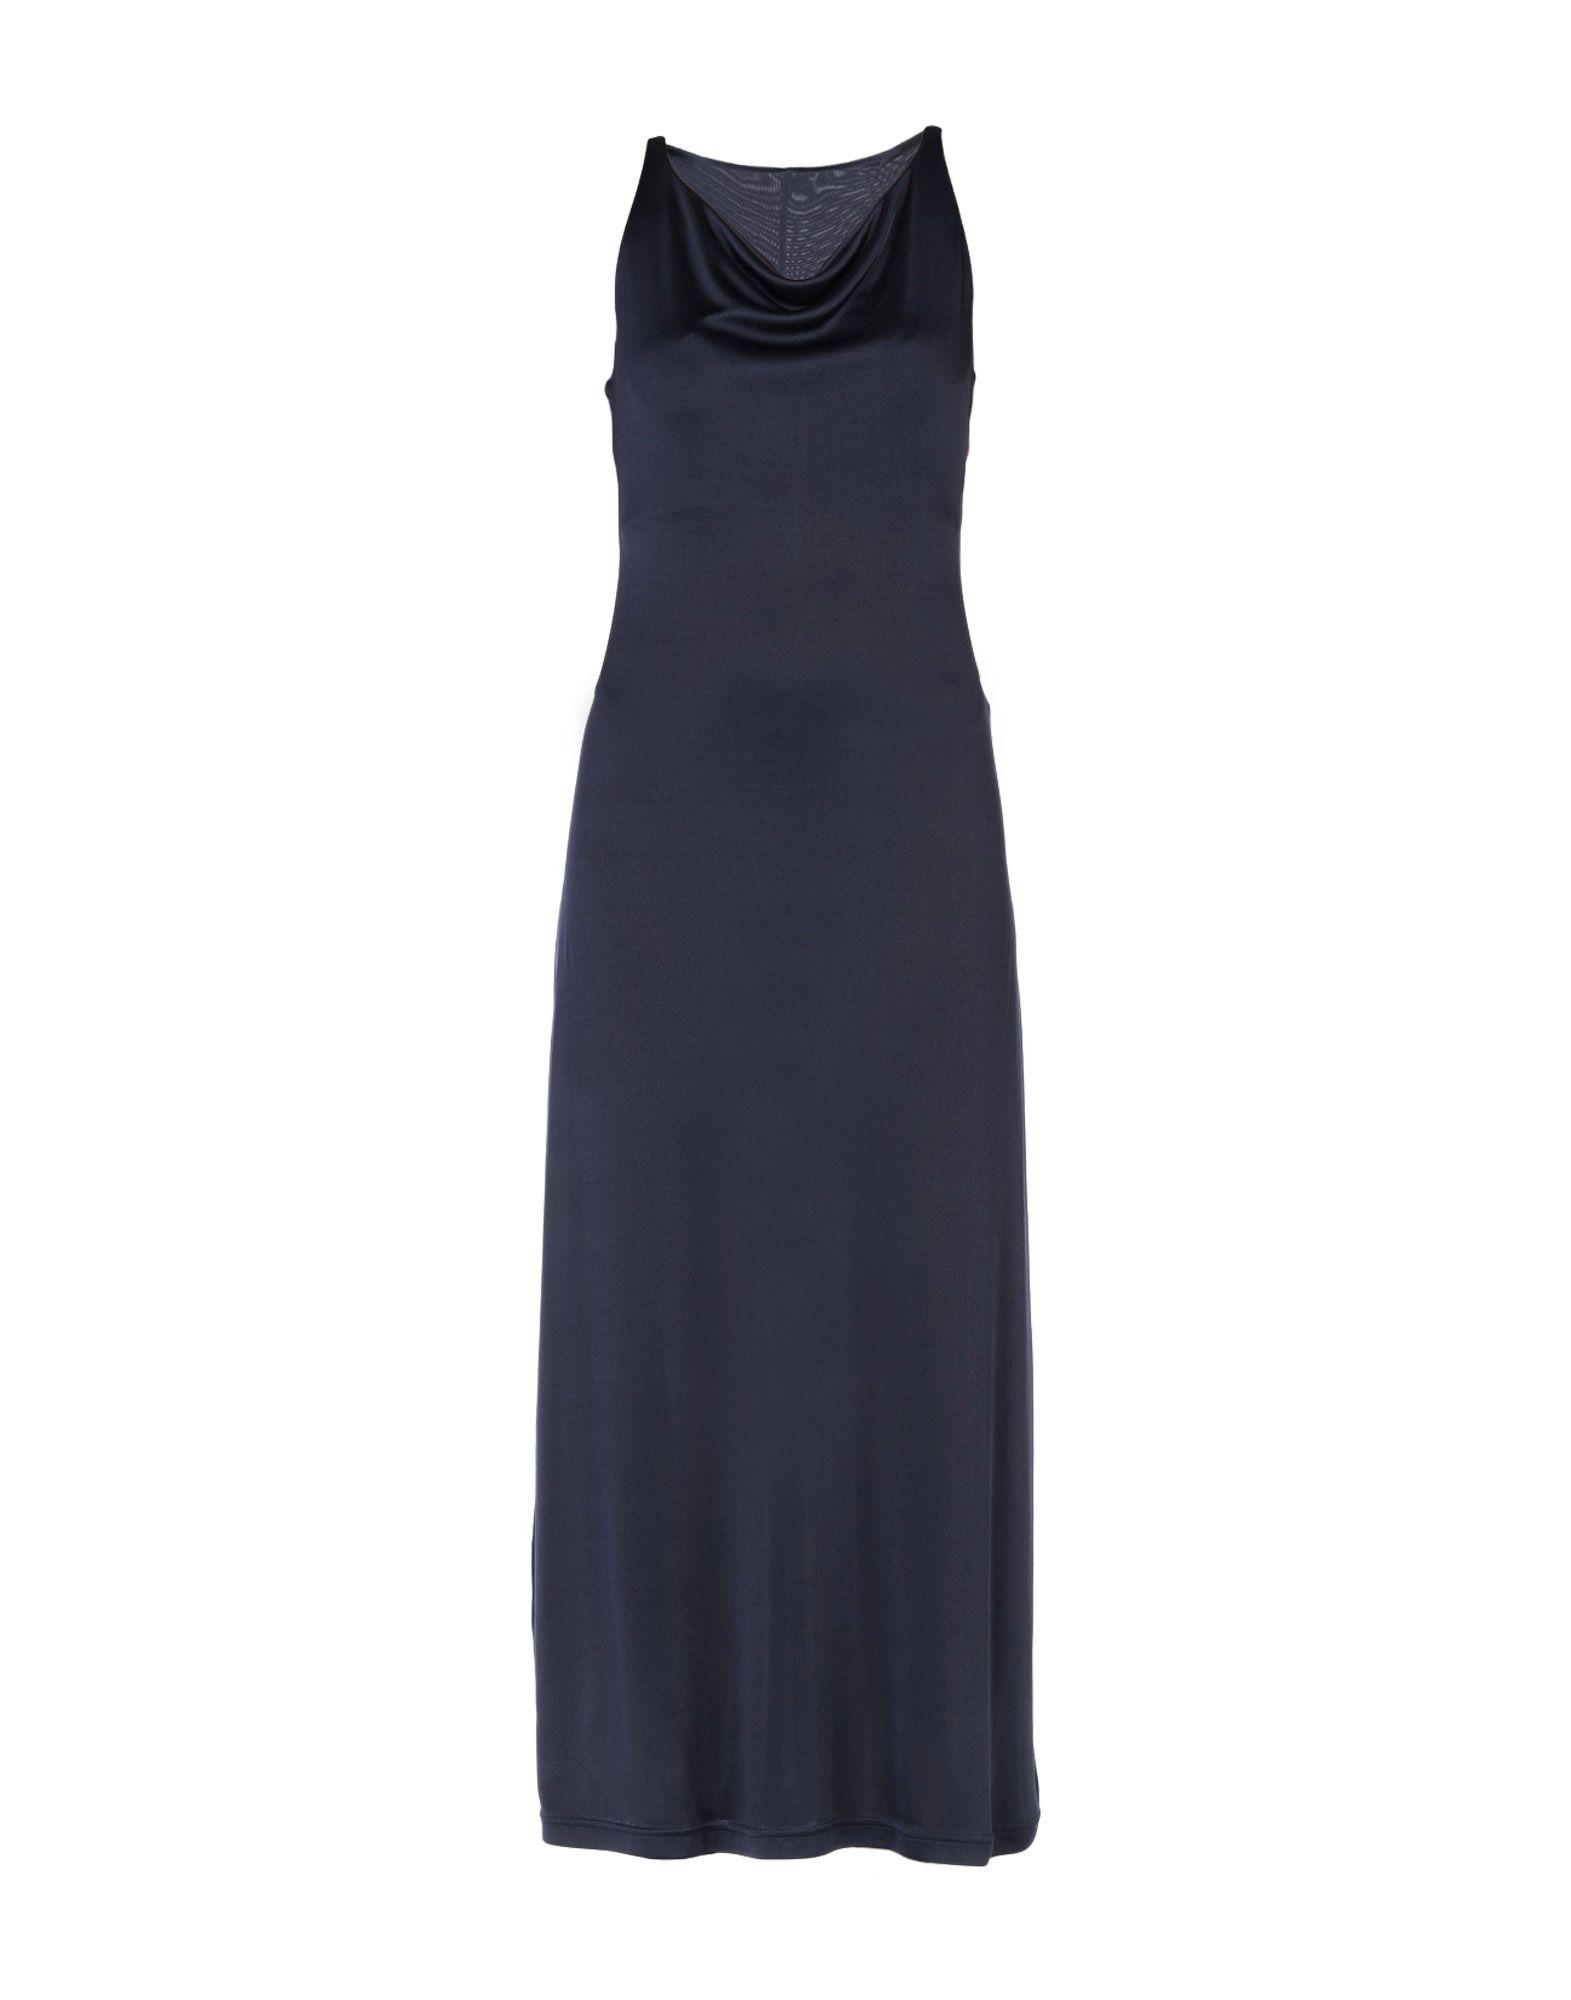 ROBERTA PUCCINI by BARONI Длинное платье